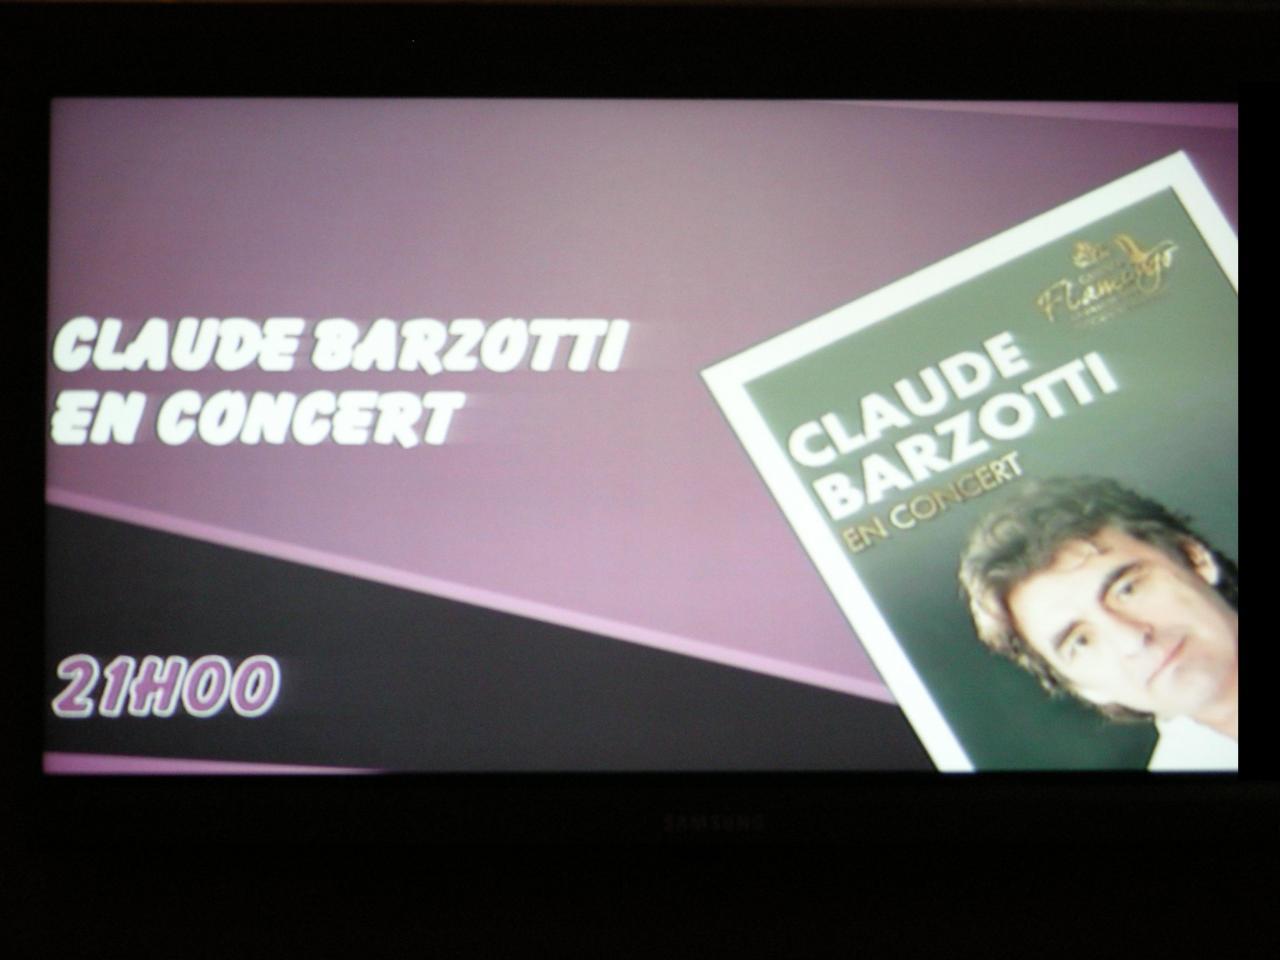 Blog de barzotti83 : Rikounet 83, Claude Barzotti le Grau du Roi 5 octobre 2012 casino le Flamingo